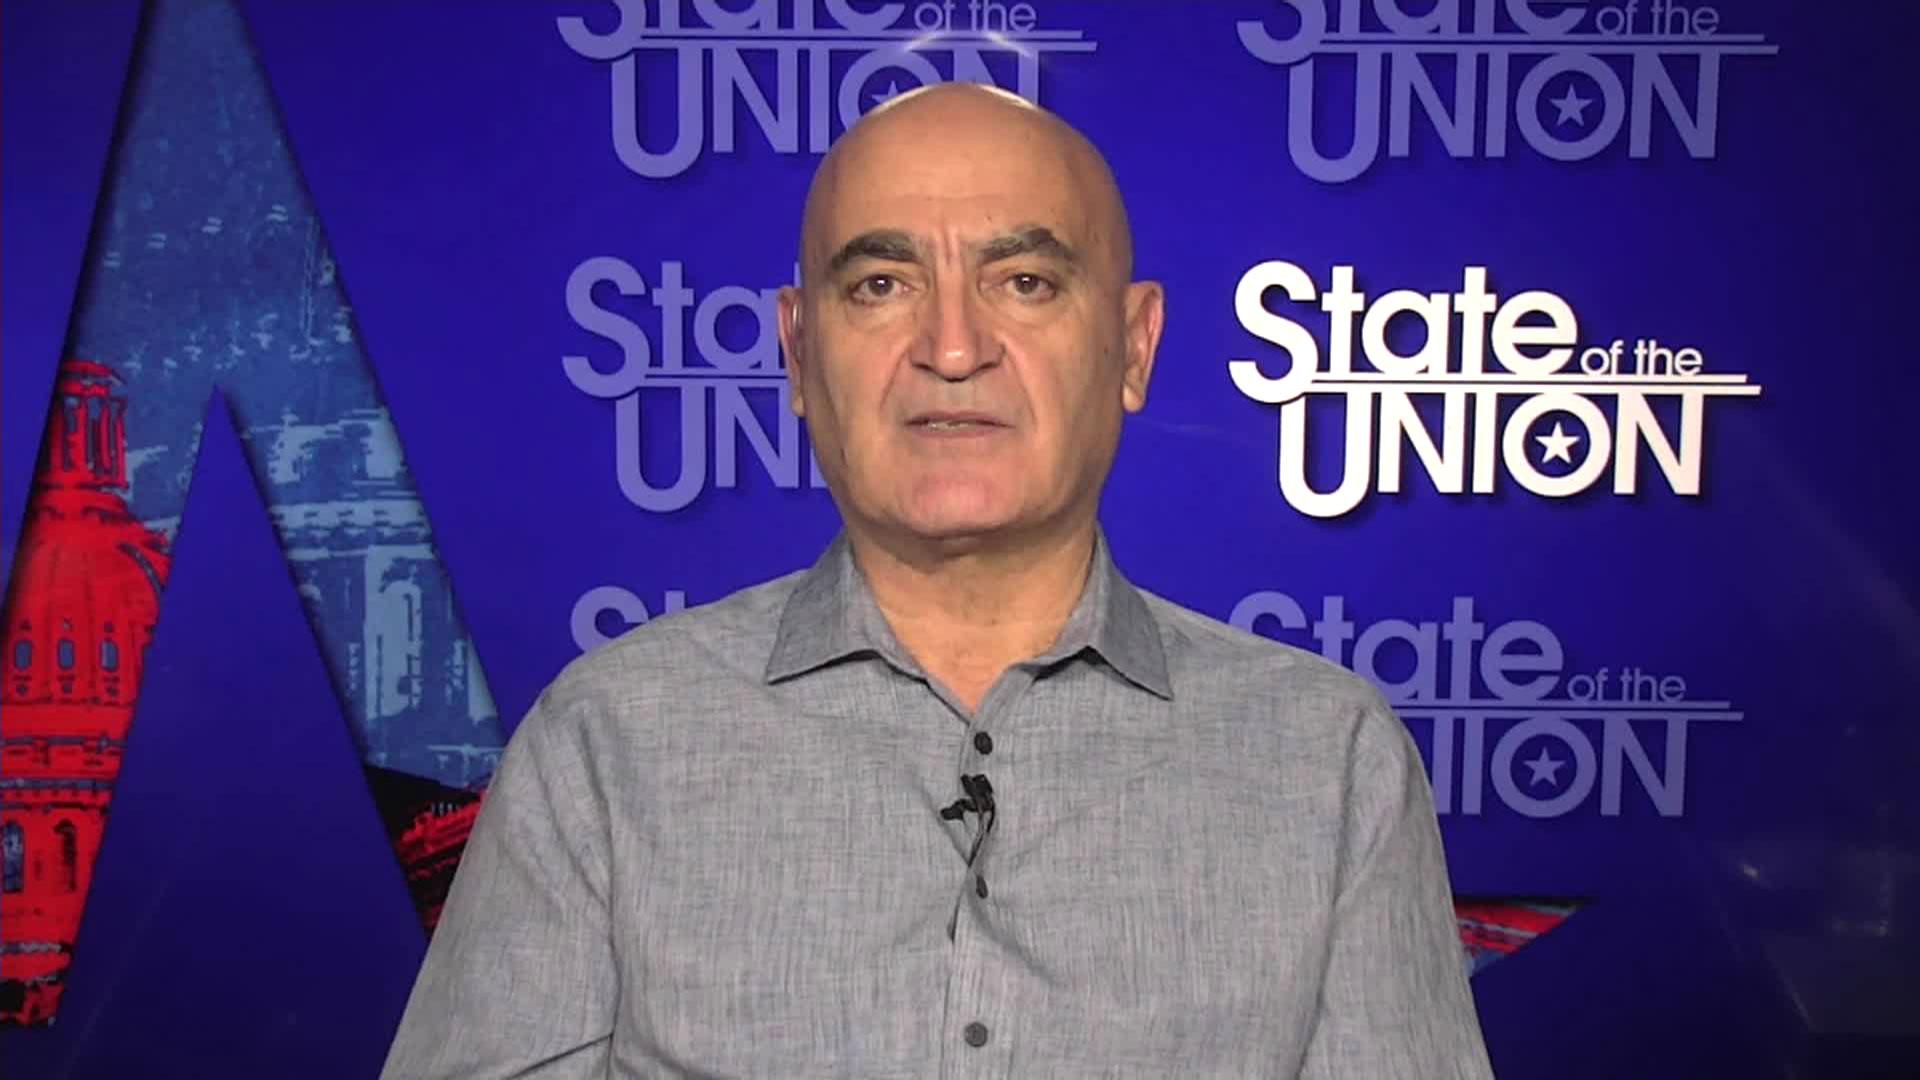 Operation Warp Speed head Moncef Slaoui speaks with CNN on Sunday, December 20.